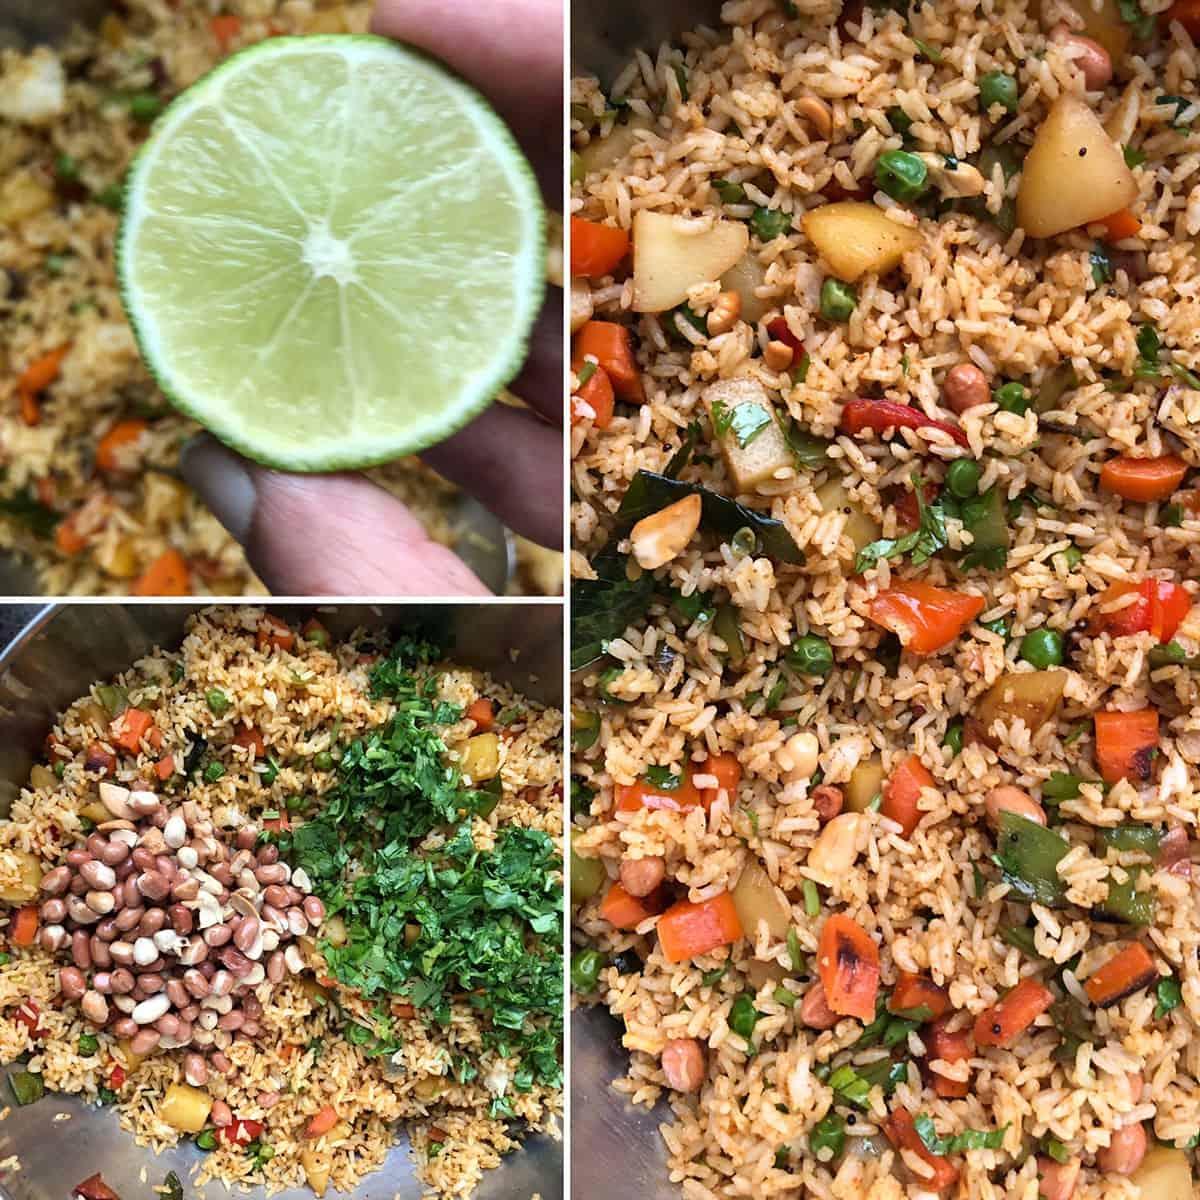 Lemon juice, nuts, chopped cilantro added to vegetable bath